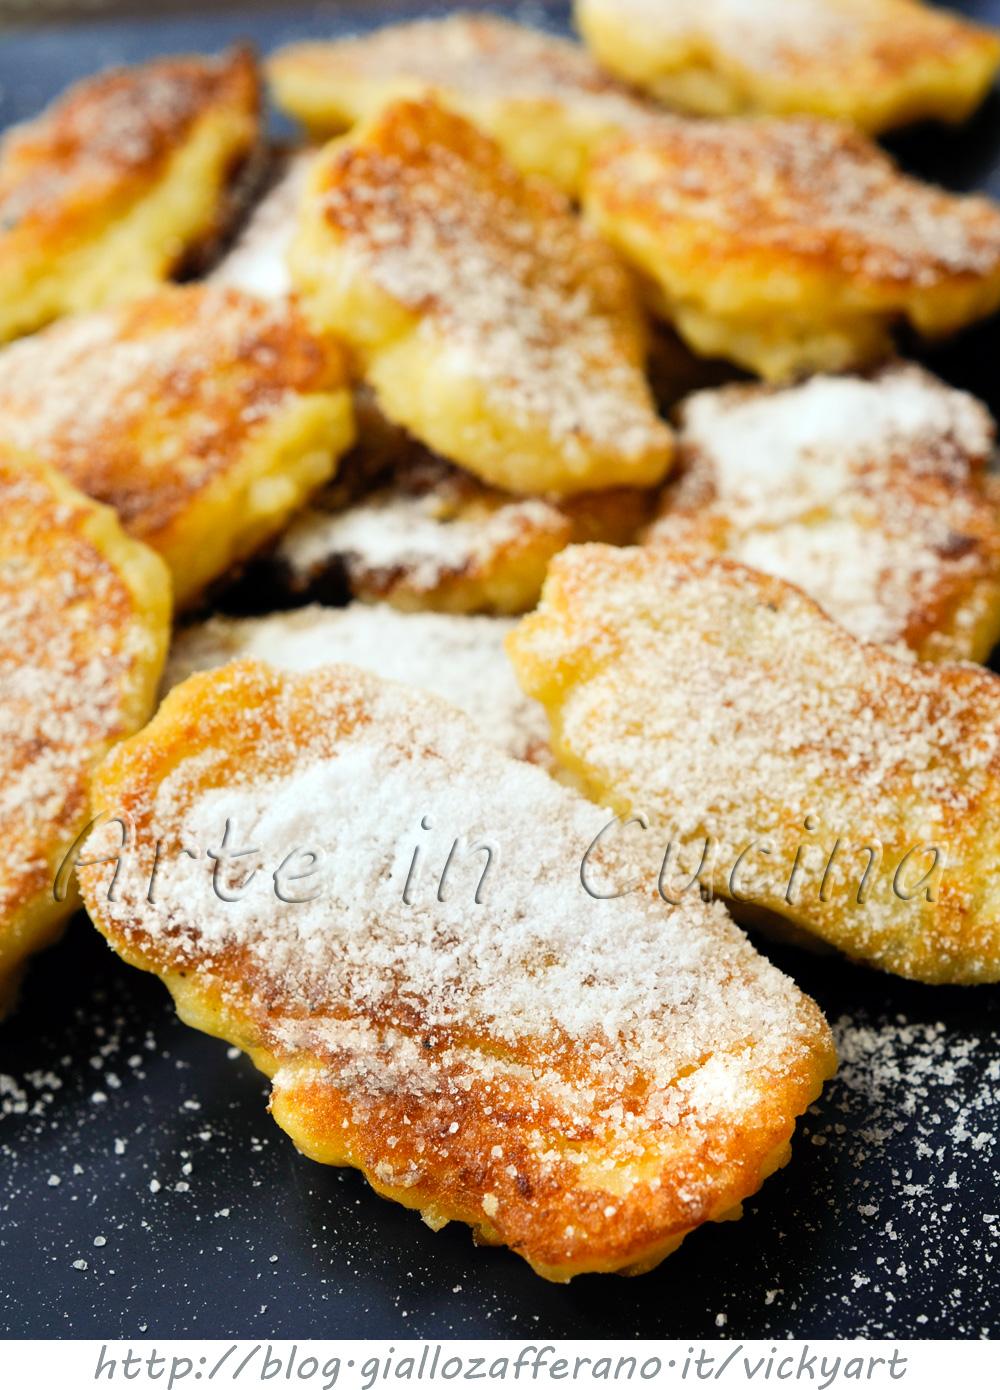 Frittelle di riso dolci di s giuseppe ricetta toscana arte in cucina - Cucina macrobiotica dolci ...